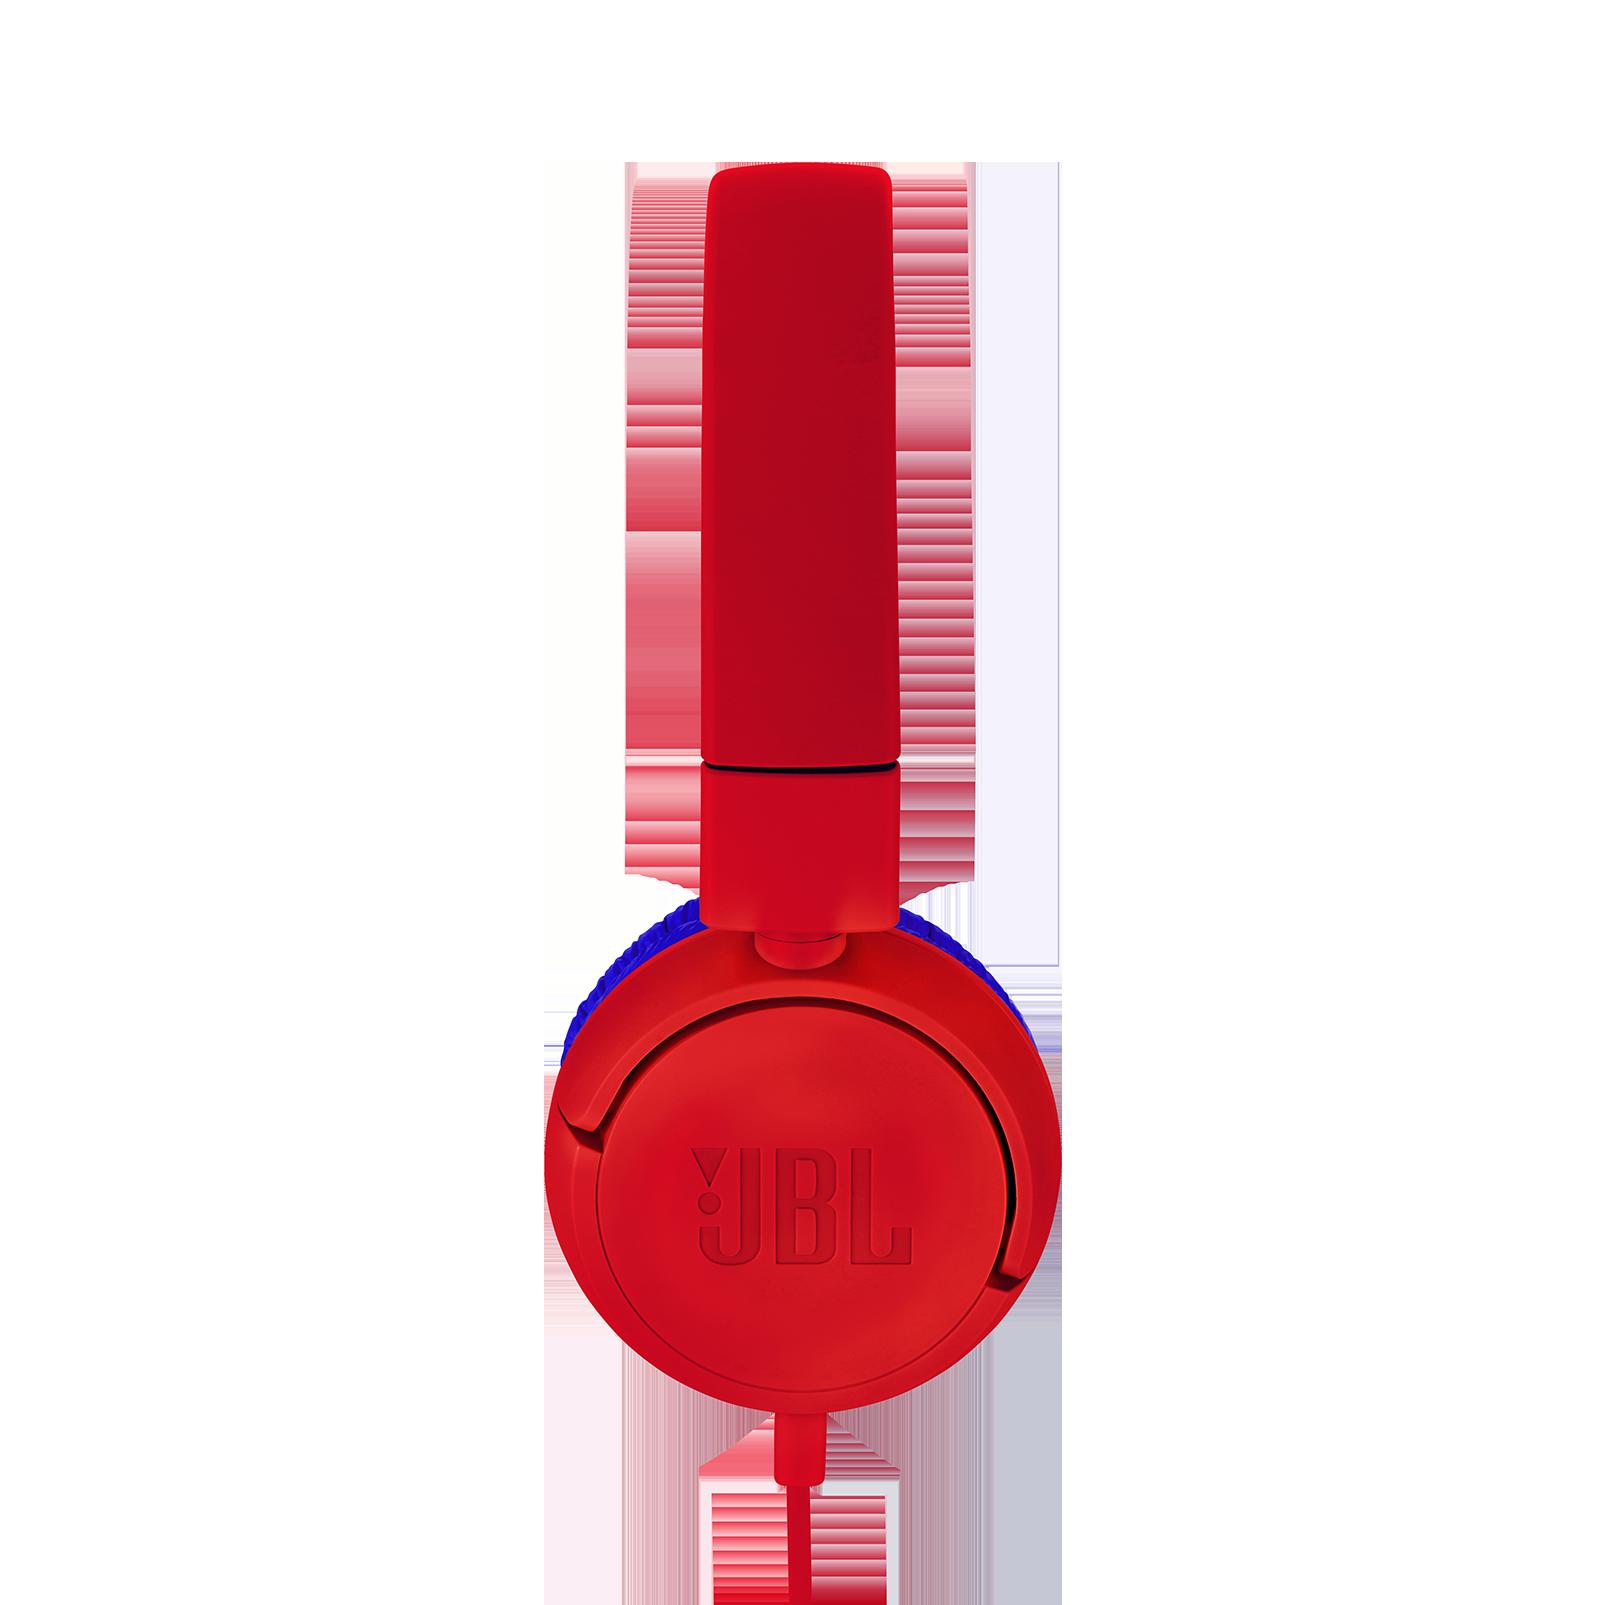 JBL JR300 - Red - Kids on-ear Headphones - Detailshot 1